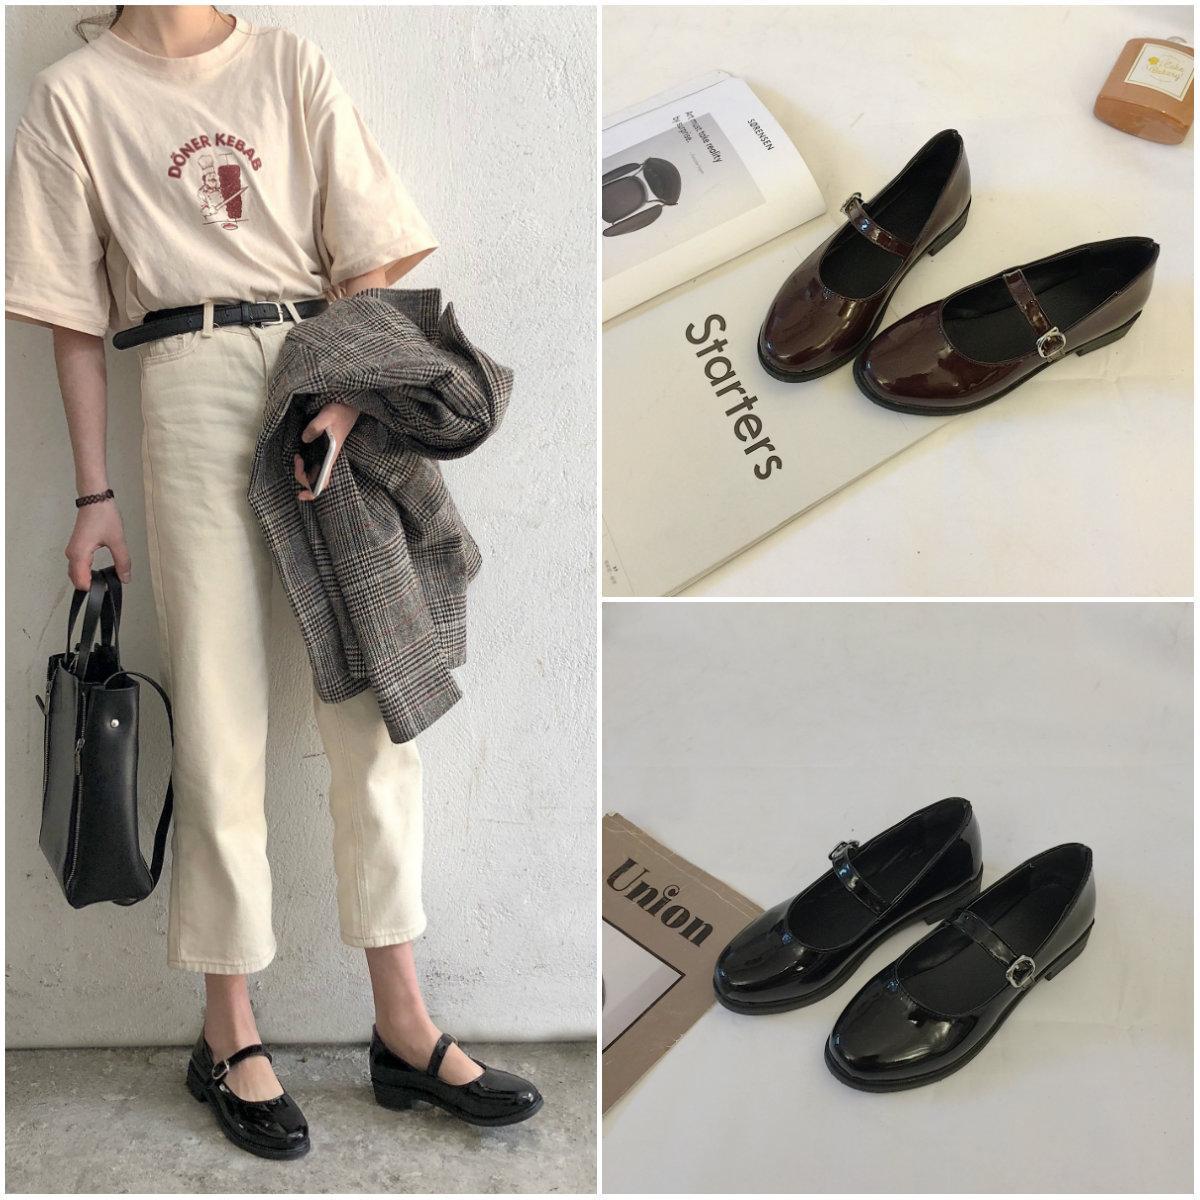 Buy Women Shoes Flat Sandal Heel Lazada Lady Jelly Sepatu Sendal Wanita